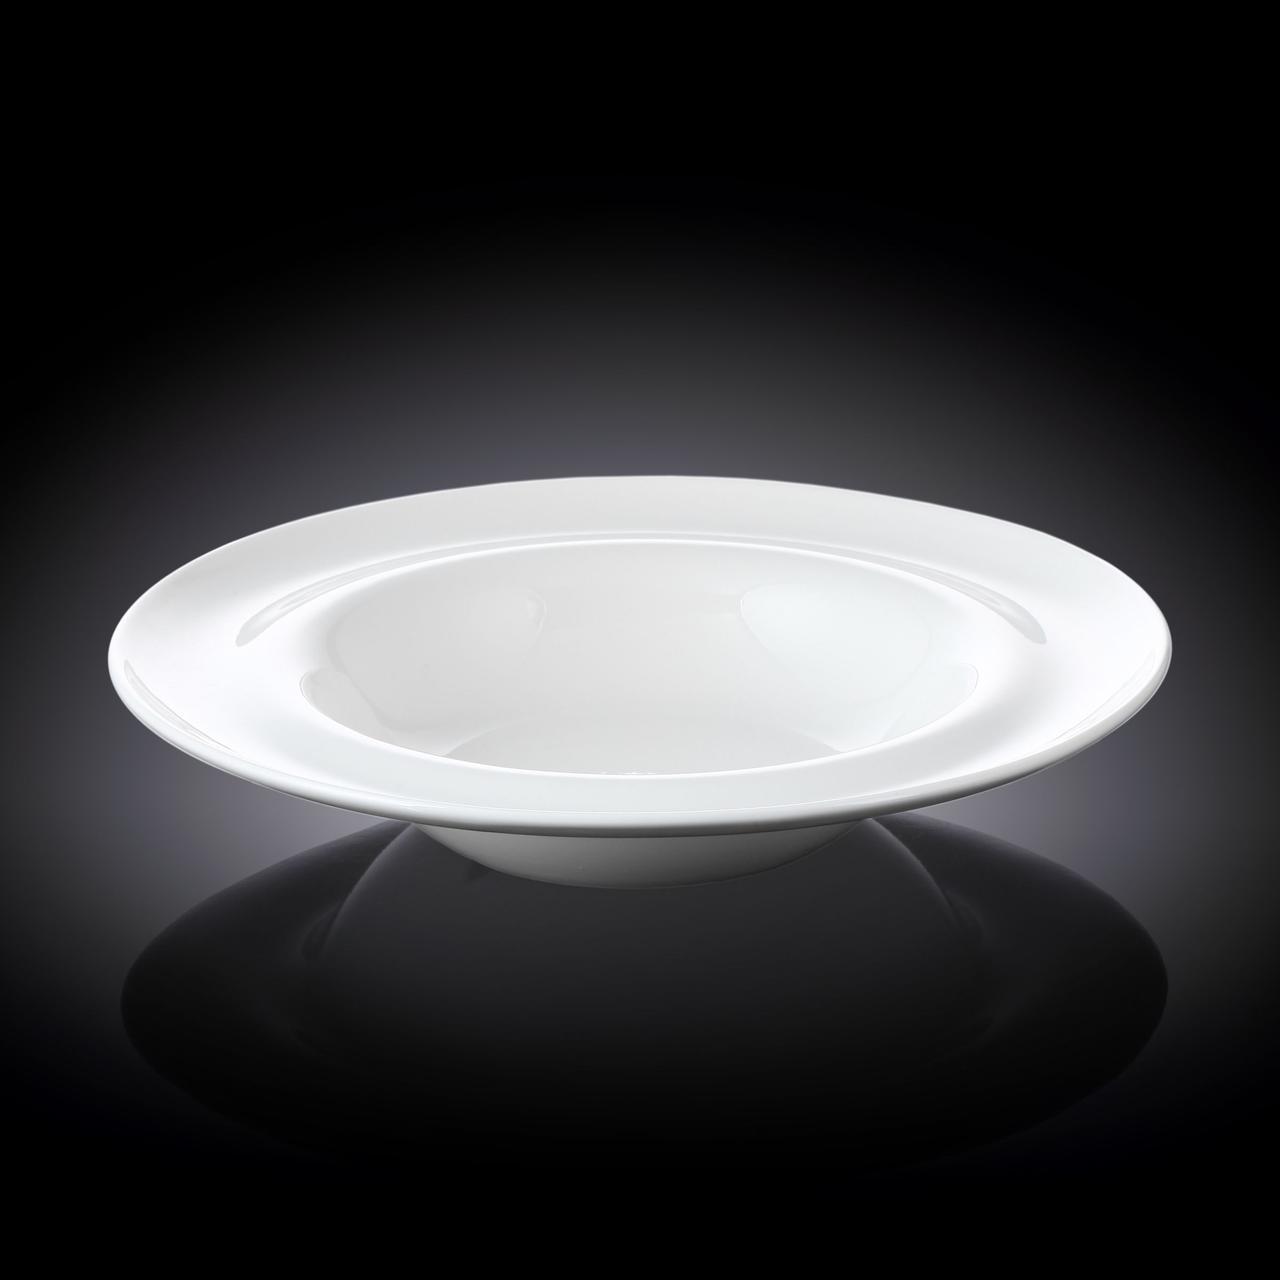 Тарелка глубокая 25.5 см WILMAX WL-991023